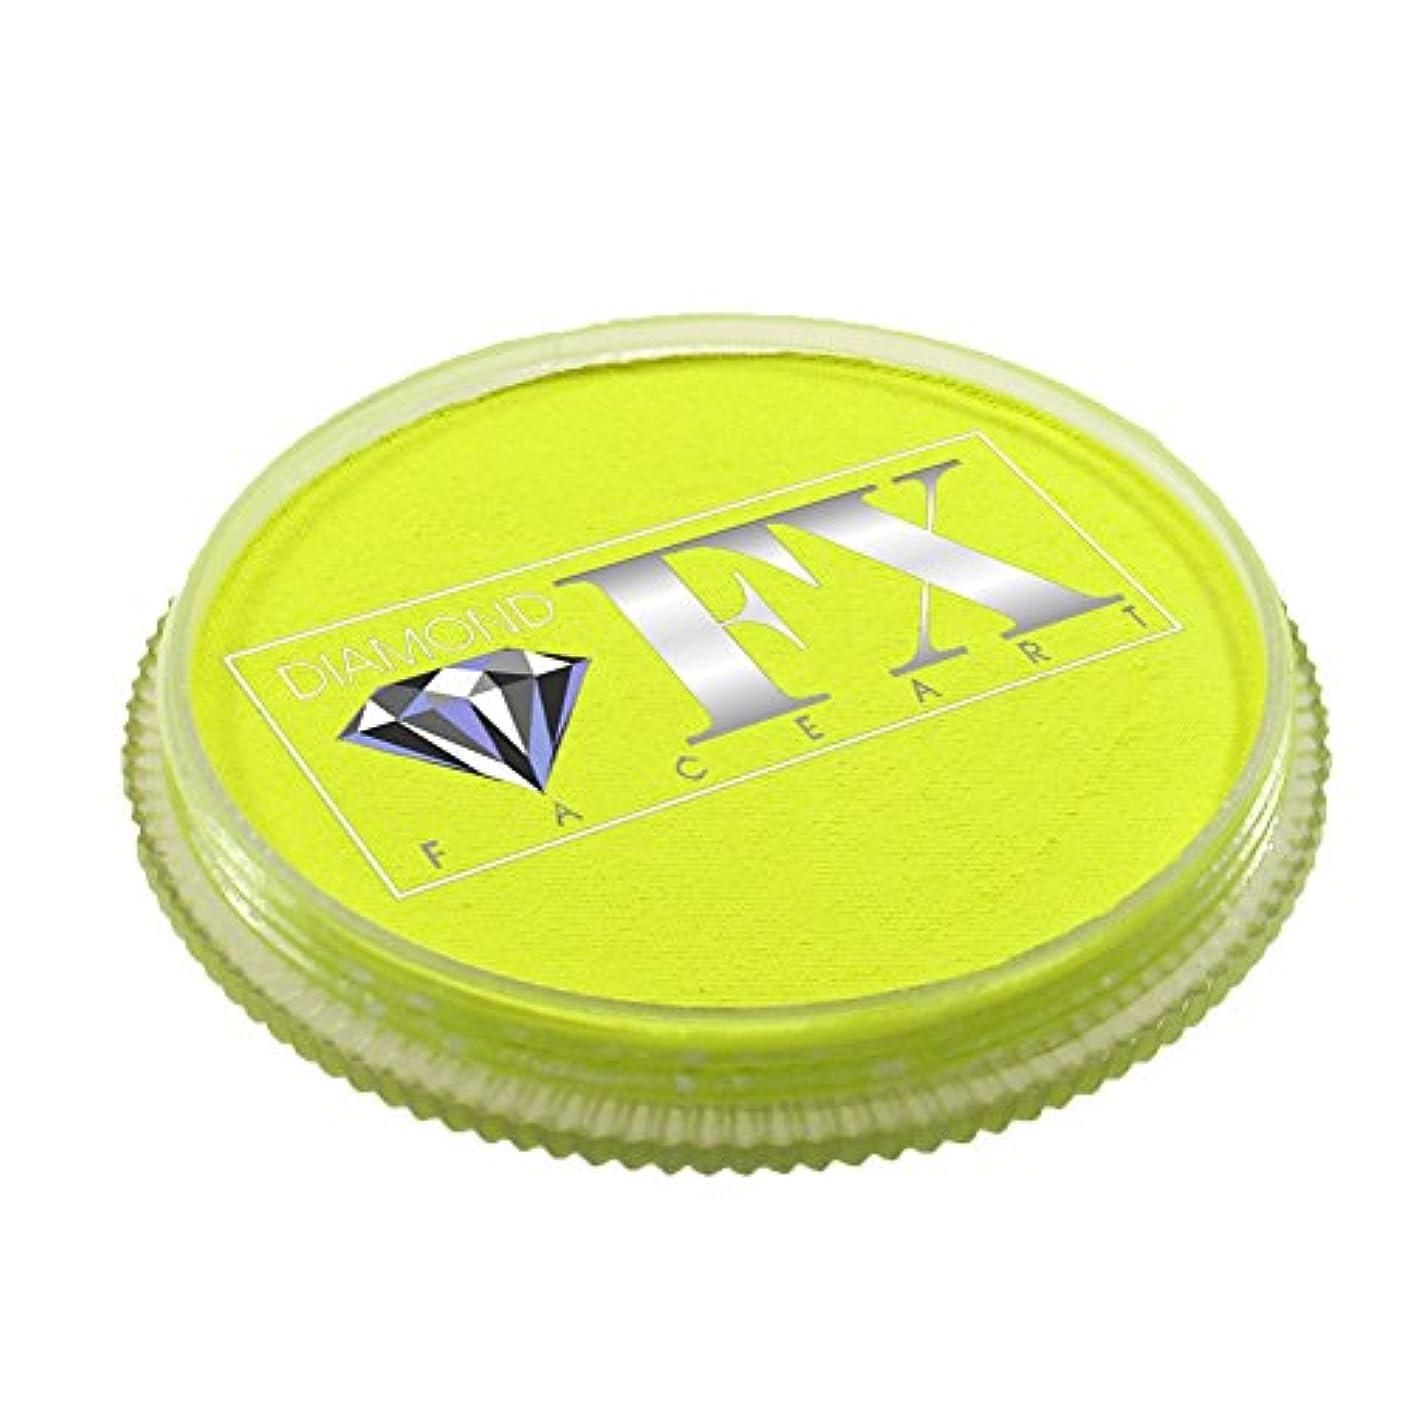 Diamond FX Neon Face Paint - Yellow (30 gm)